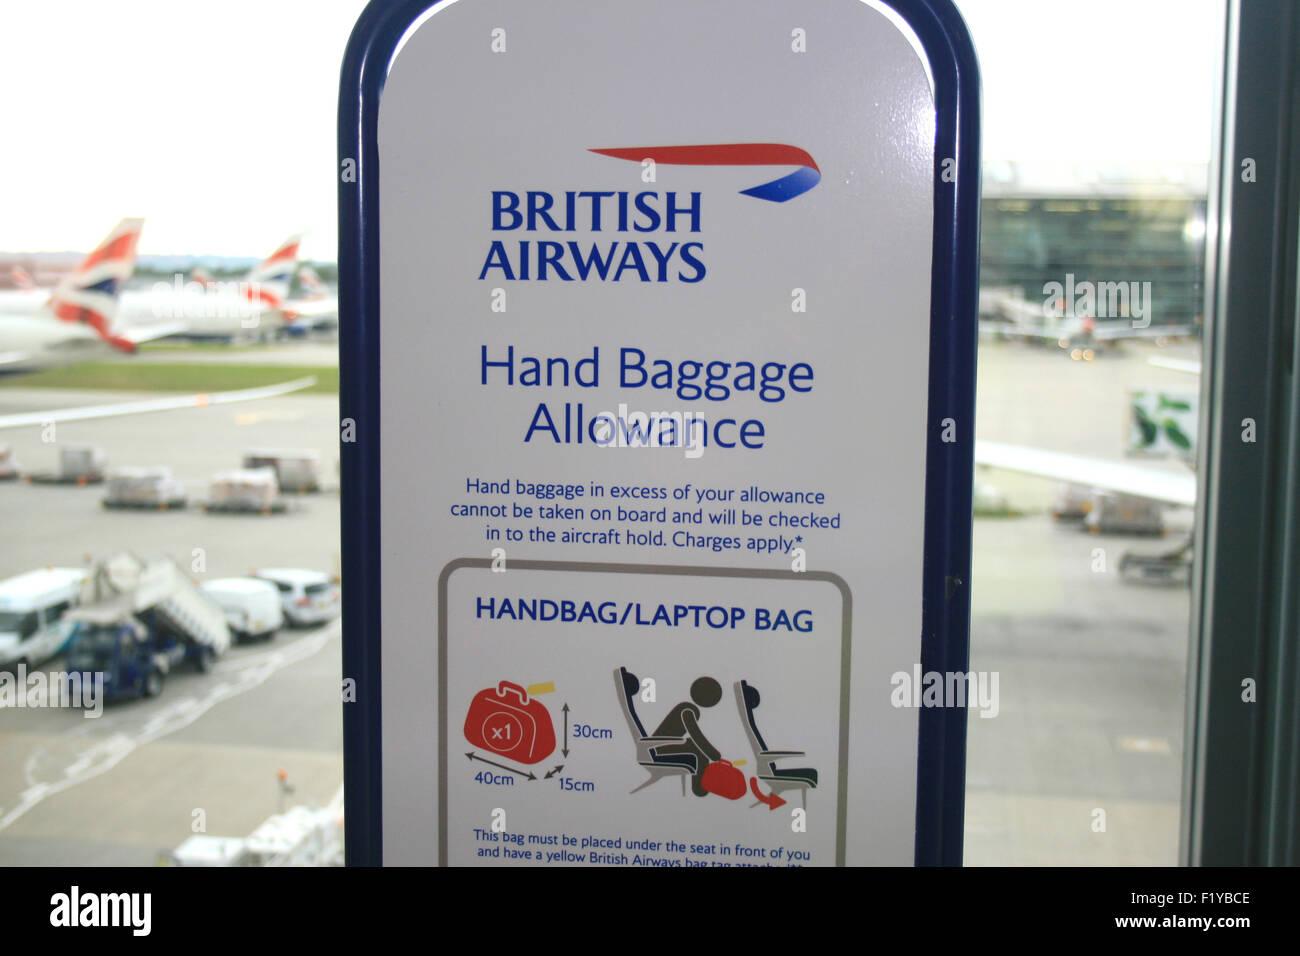 BRITISH AIRWAYS HAND BAGGAGE ALLOWANCE TERMINAL FIVE 5 - Stock Image